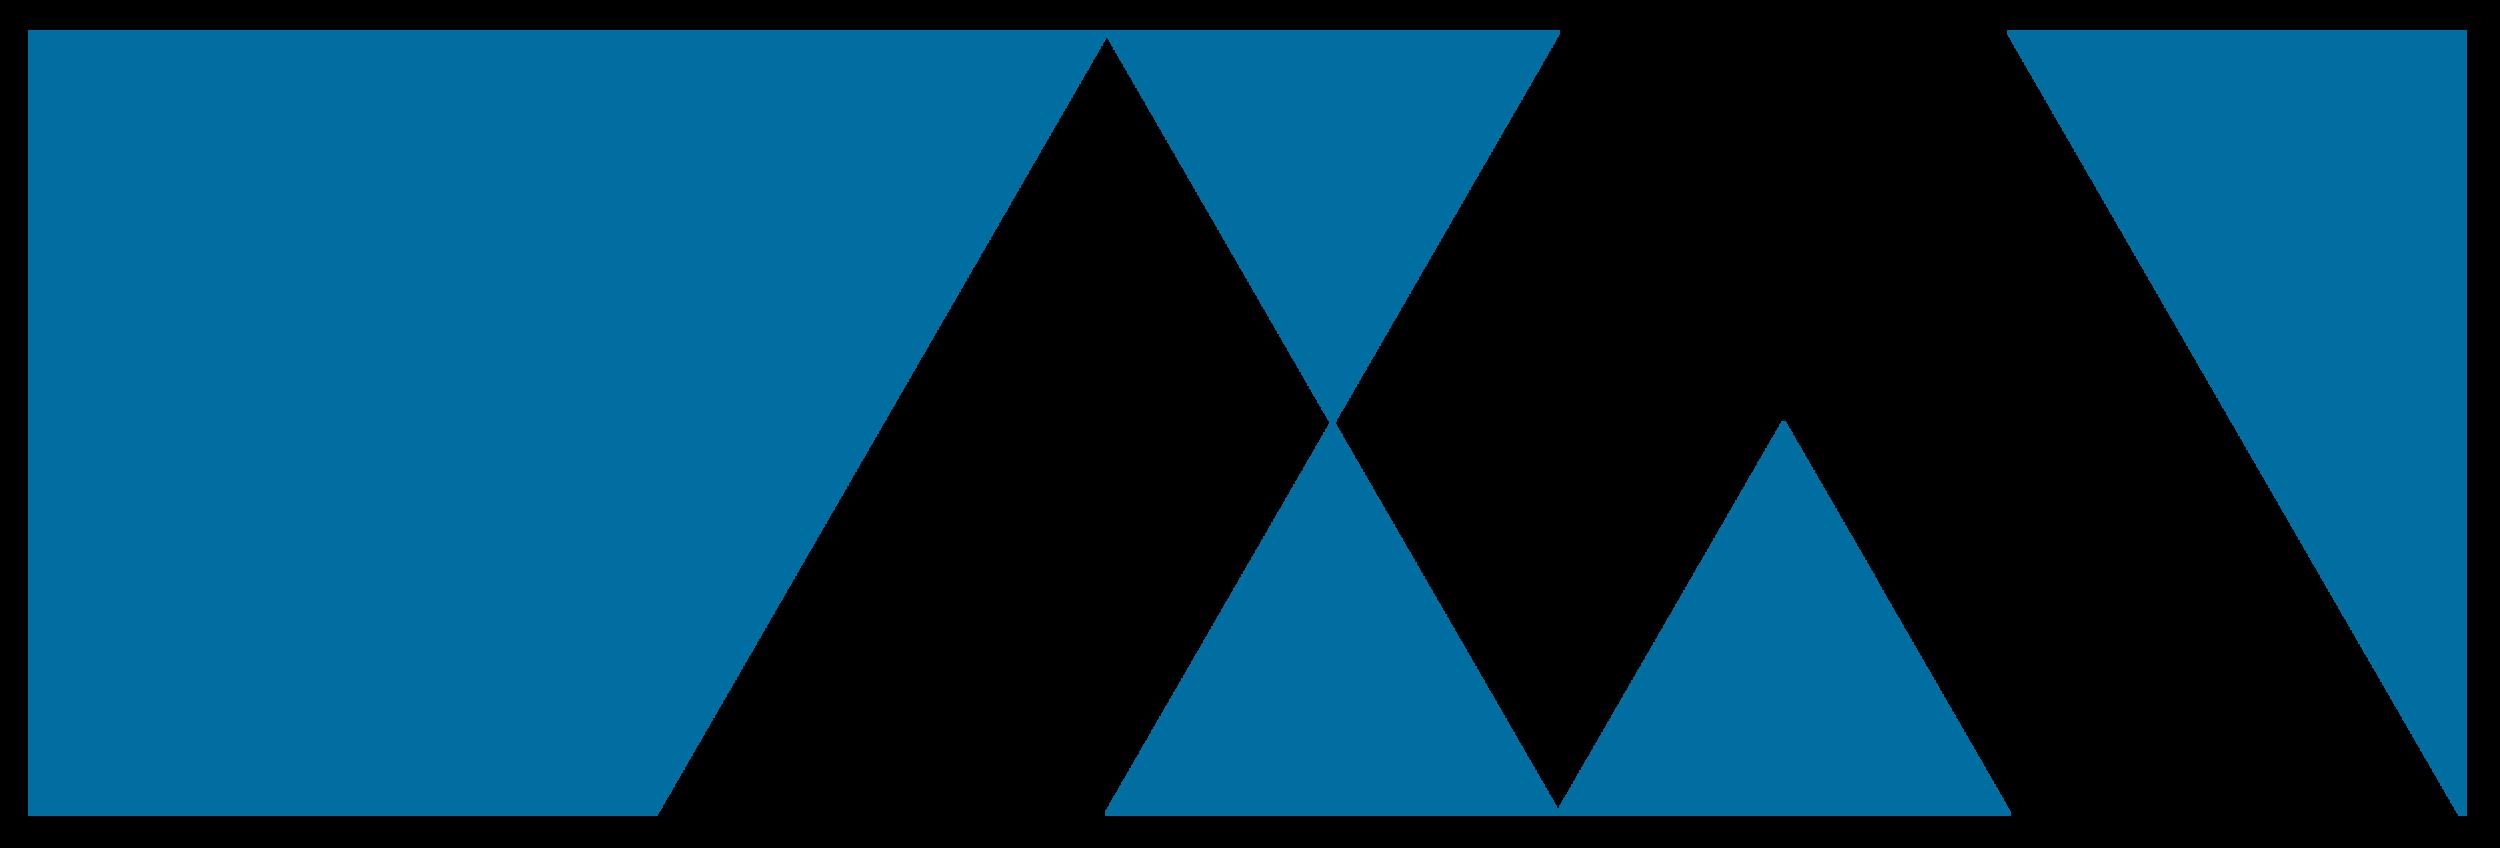 Logo New Marimetrics-13.png